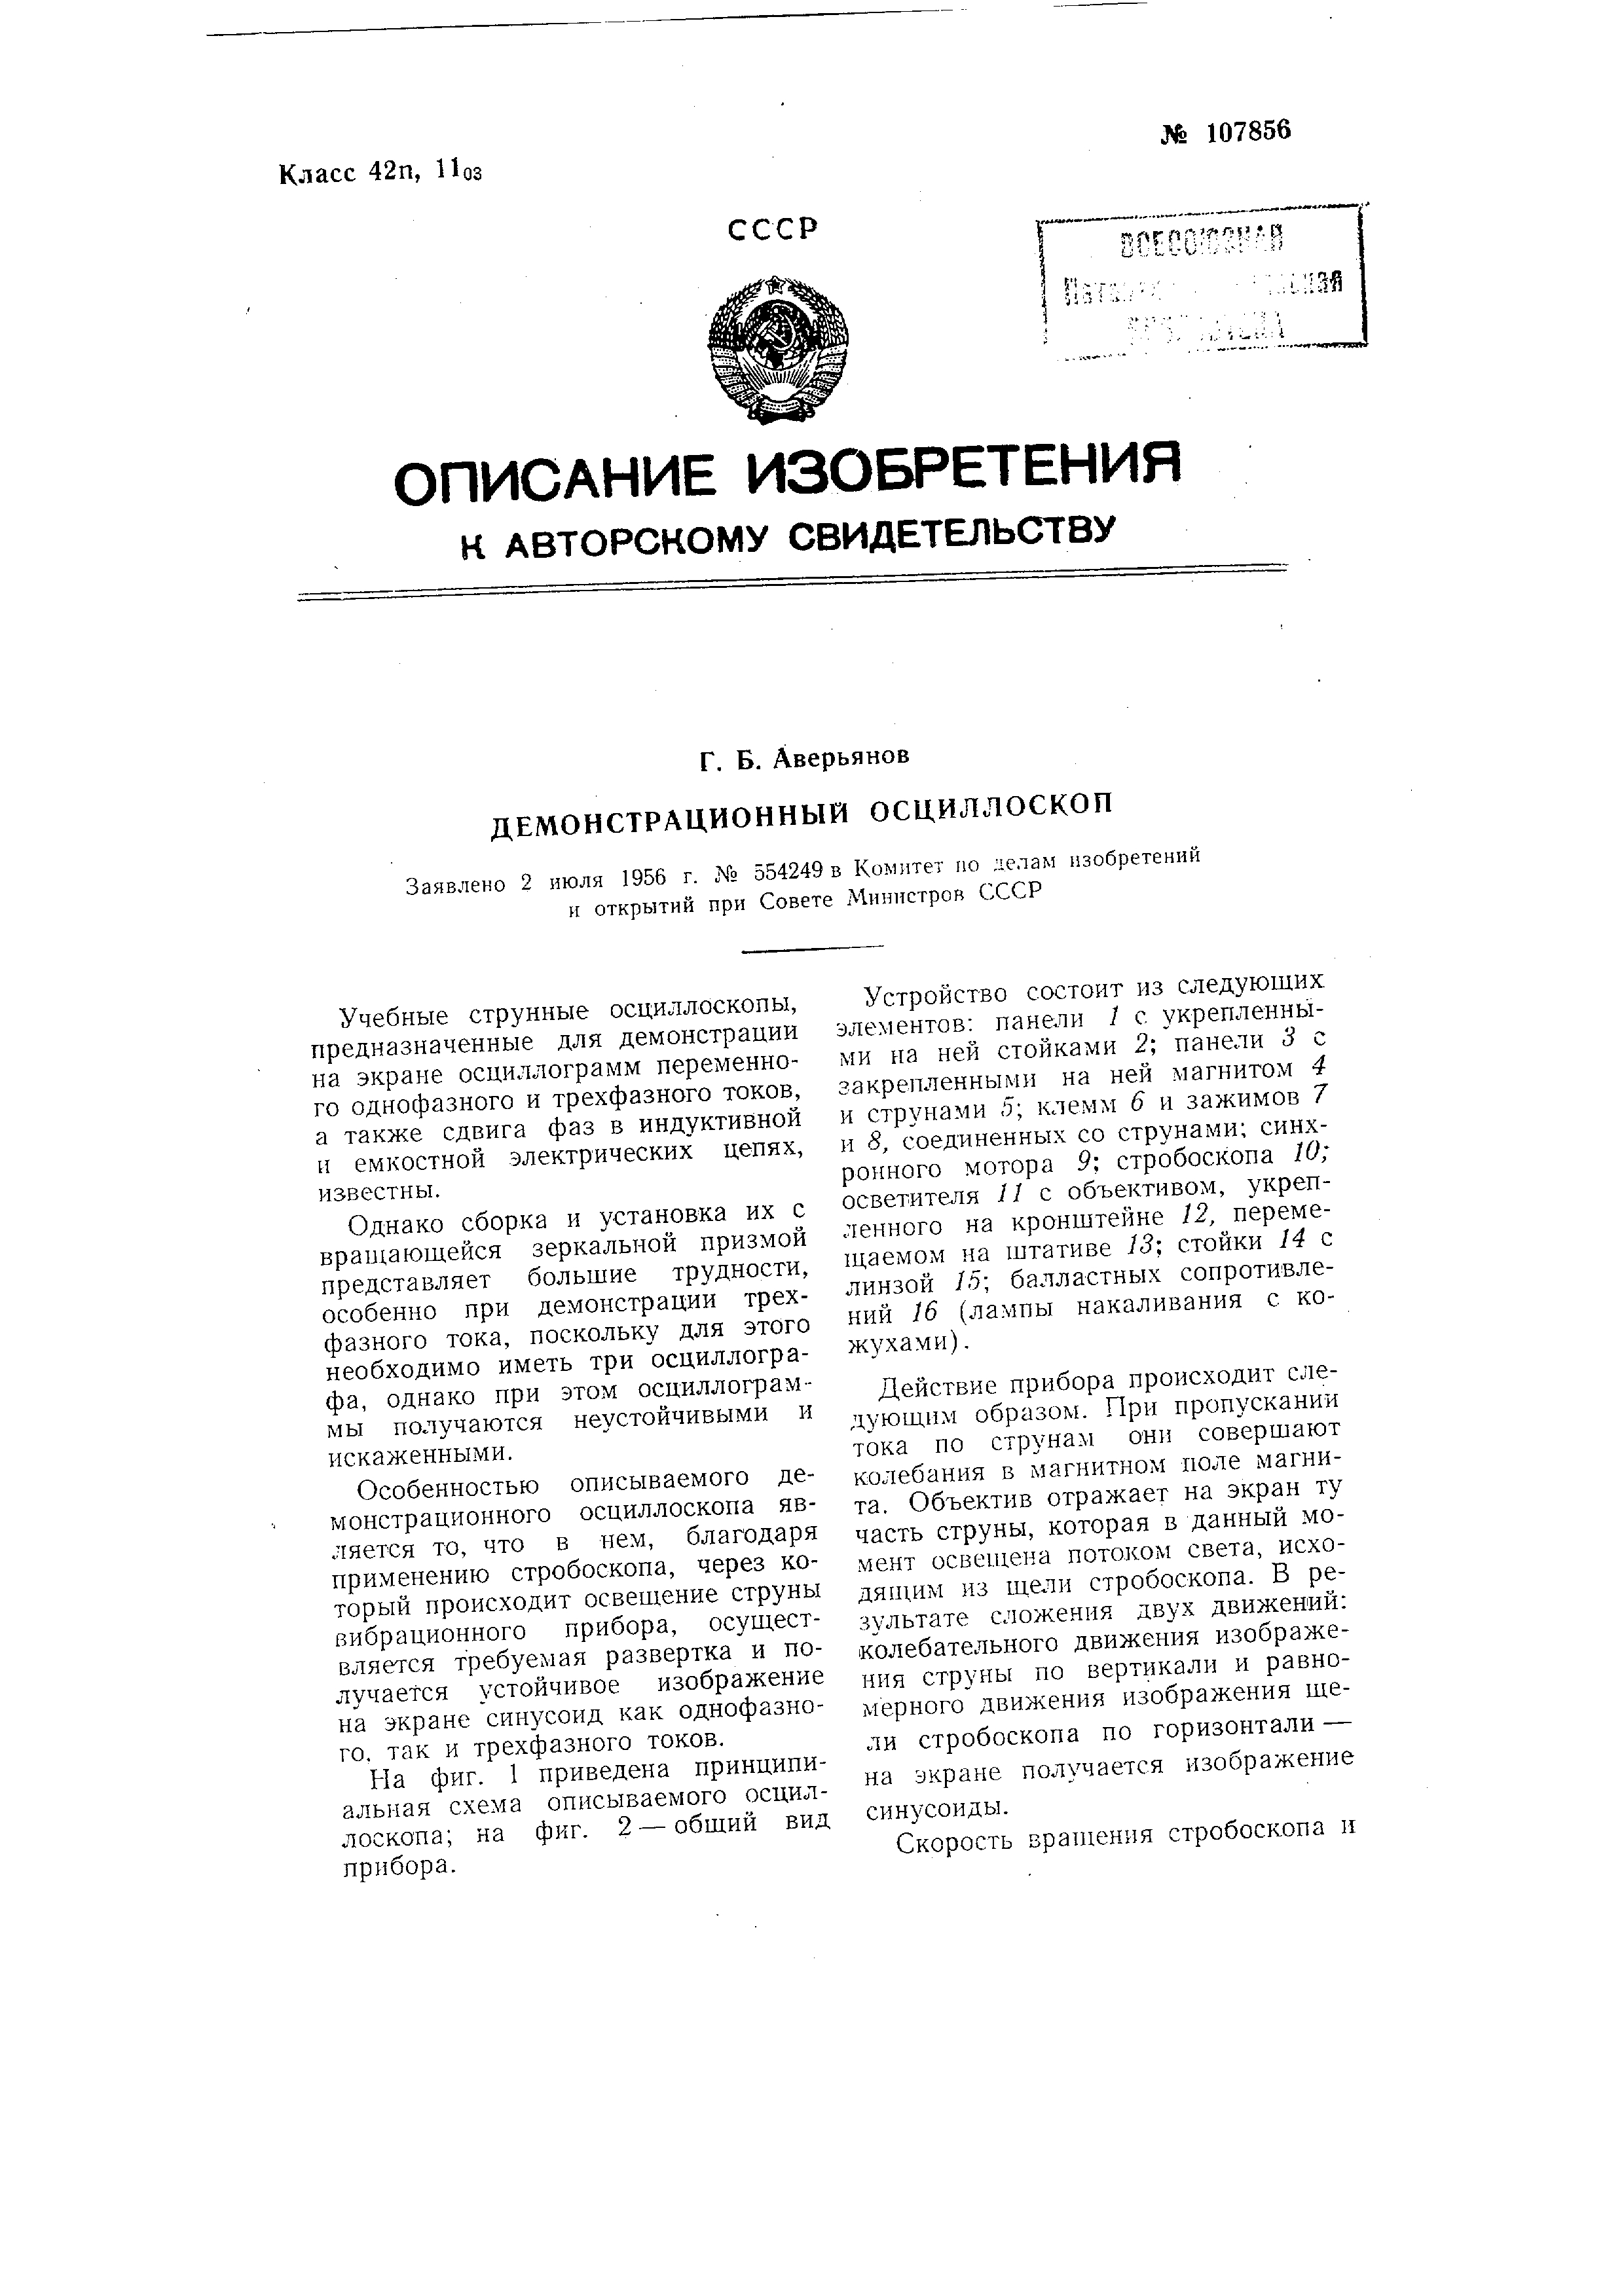 Осциллоскоп